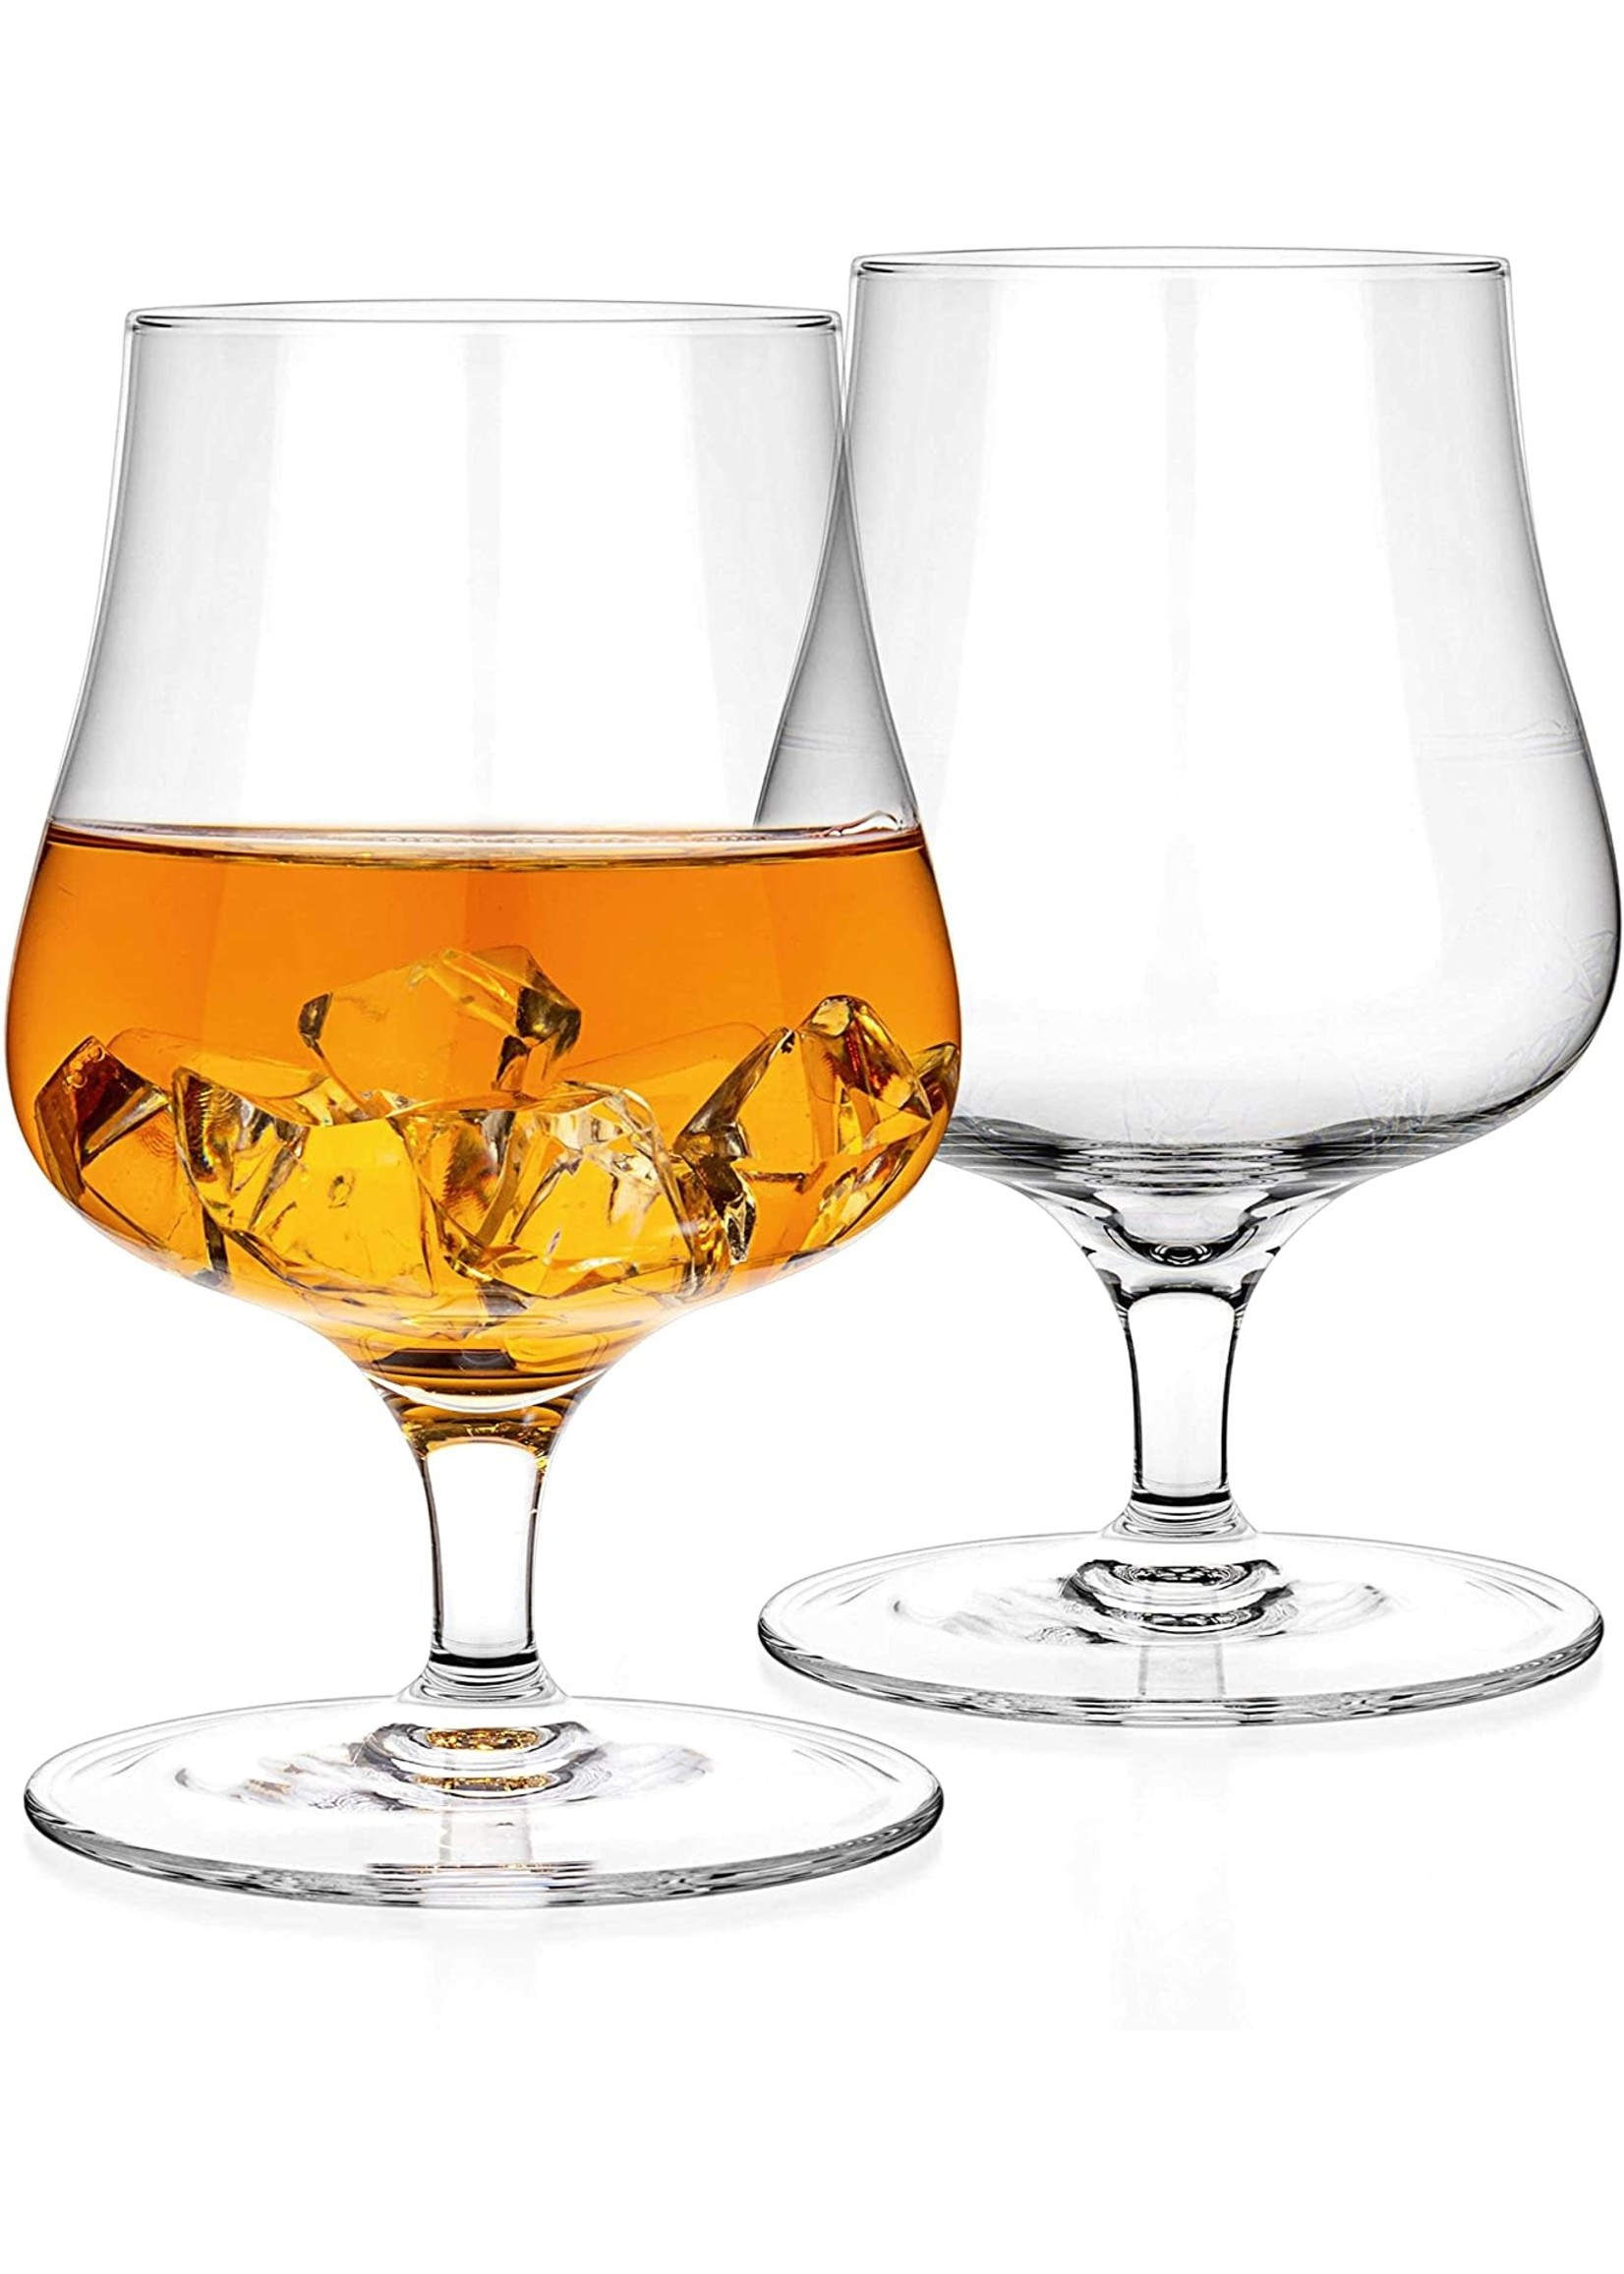 Luxbe - Cognac Brandy Crystal Glass